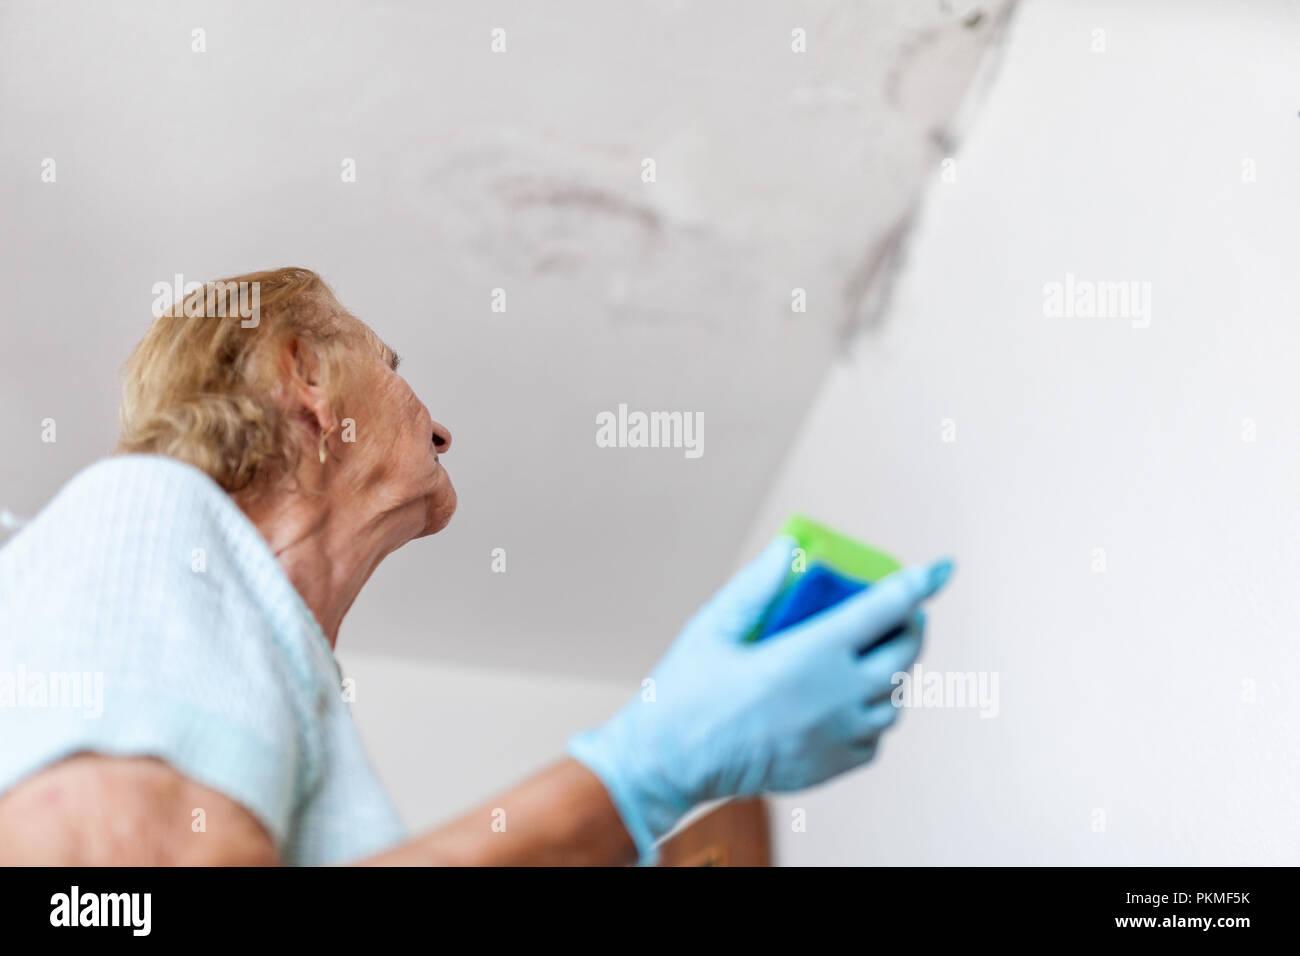 Parete Dacqua In Casa : Damp ceiling and wall immagini damp ceiling and wall fotos stock